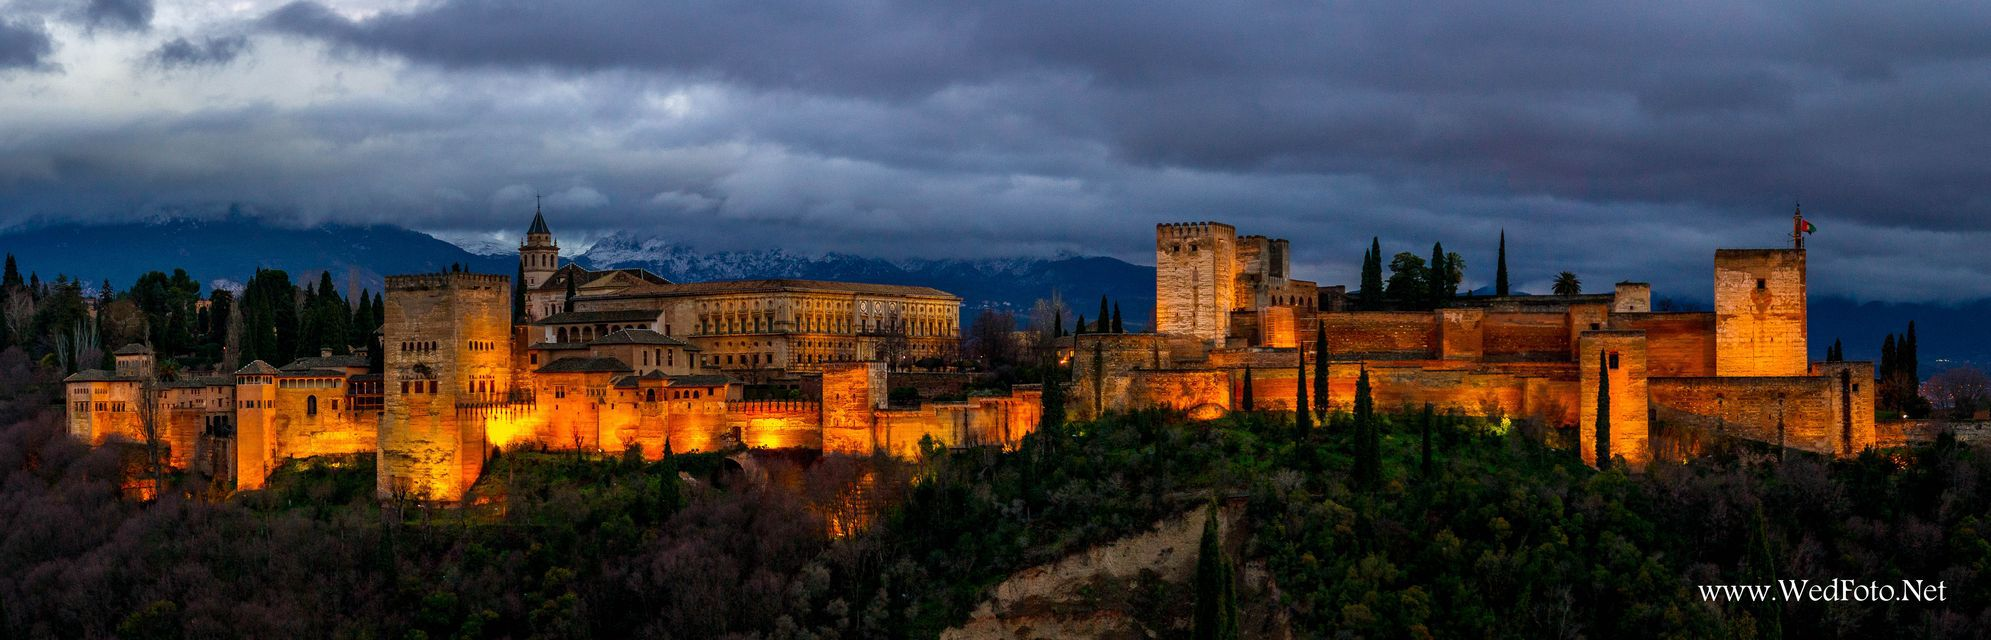 Alhambra alumbrada de noche